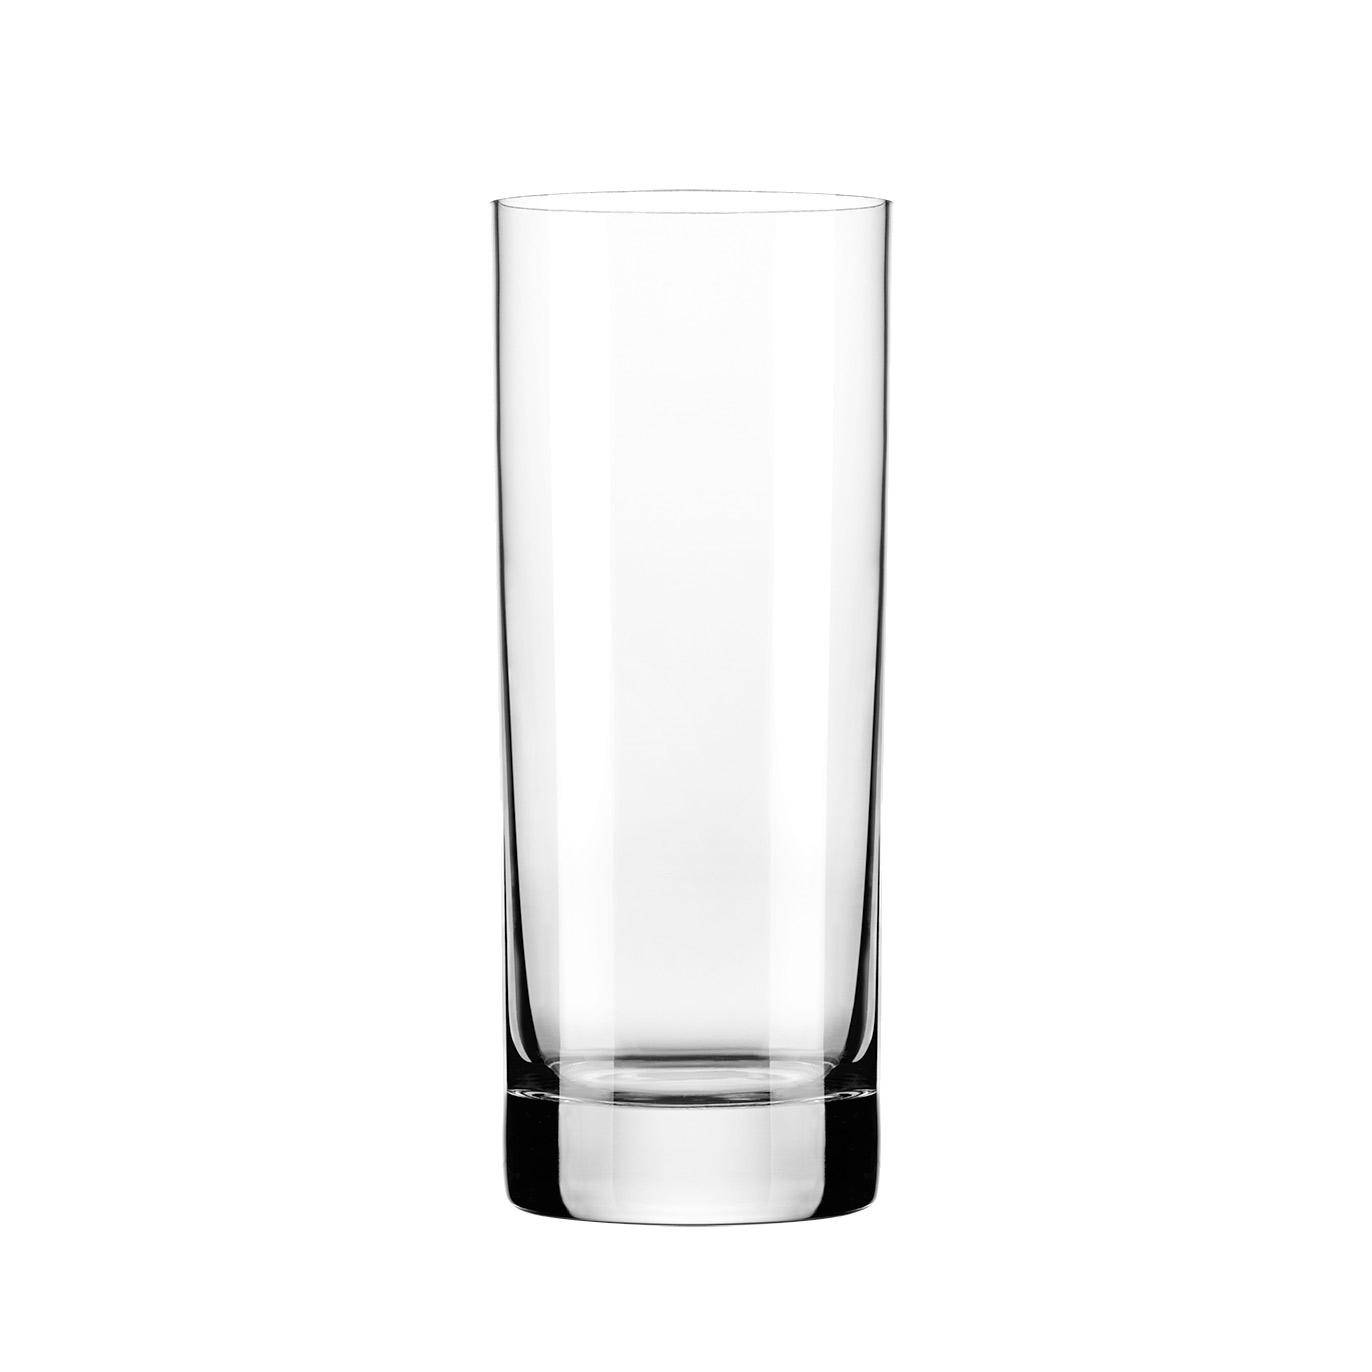 Libbey Glass 9039 glass, water / tumbler